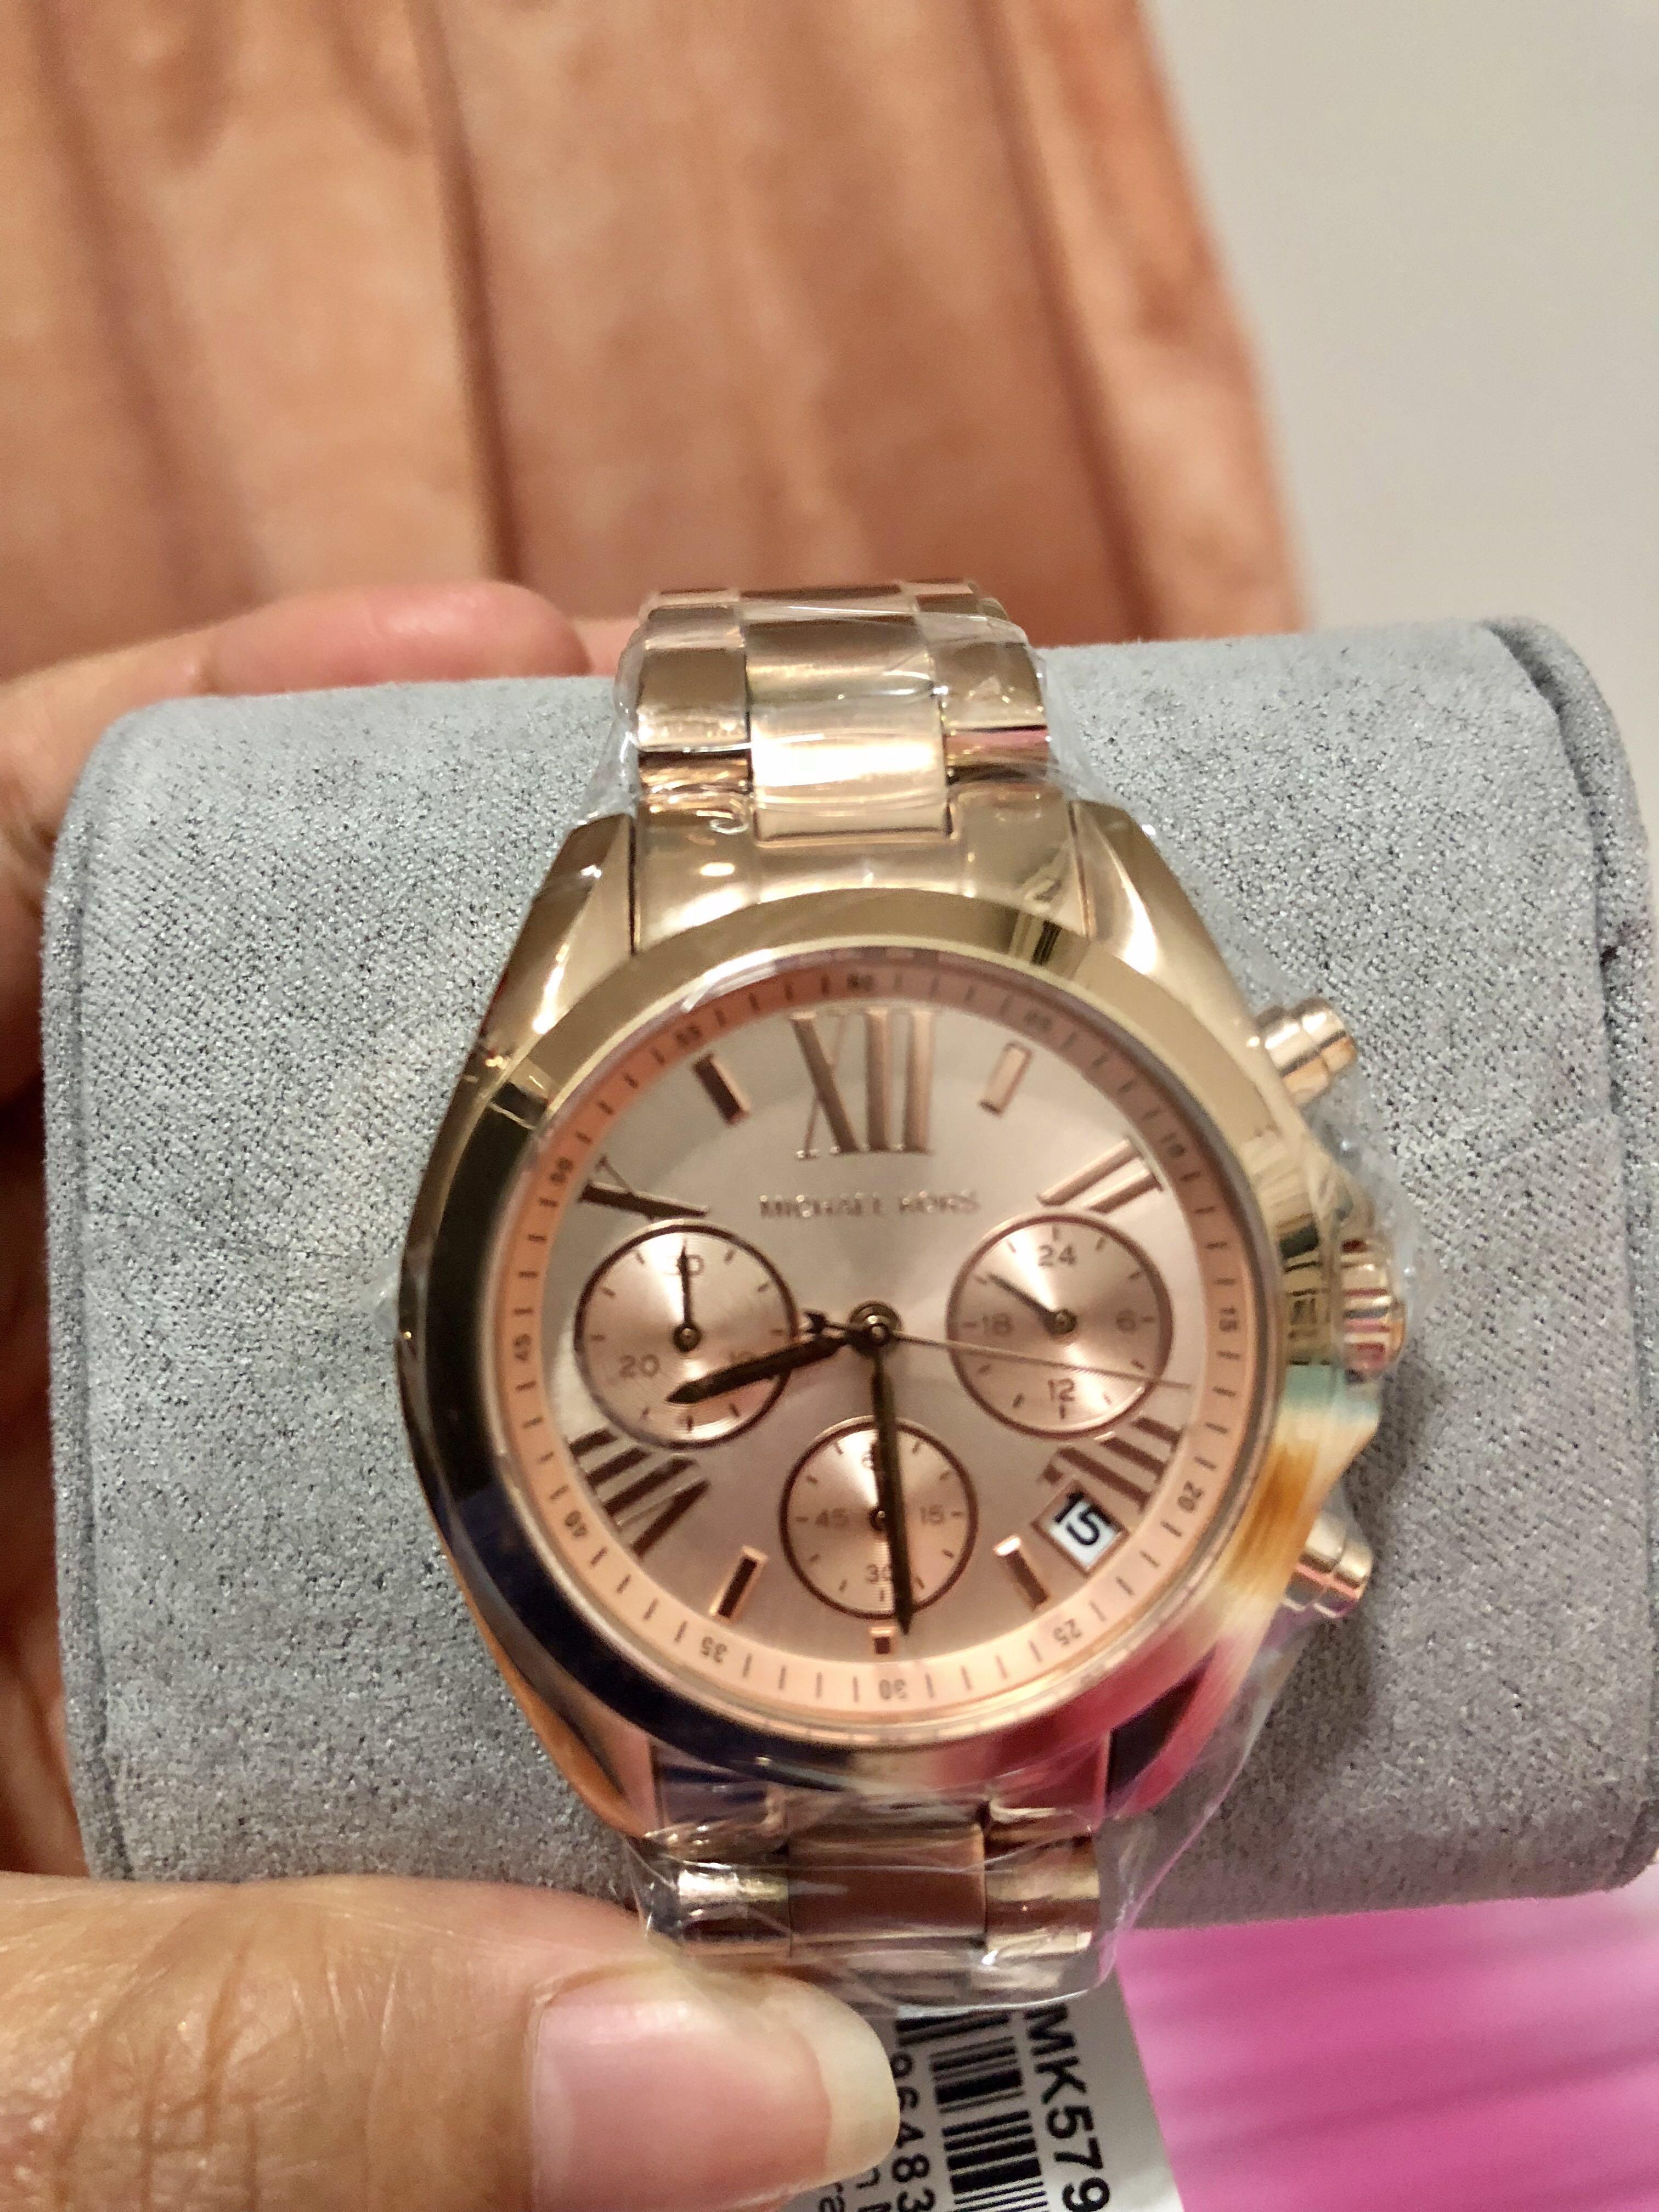 81d02ddfeba2 Authentic Michael Kors Watch MK5799 Mini-Bradshaw Rose-Gold Tone Stainless Steel  Watch